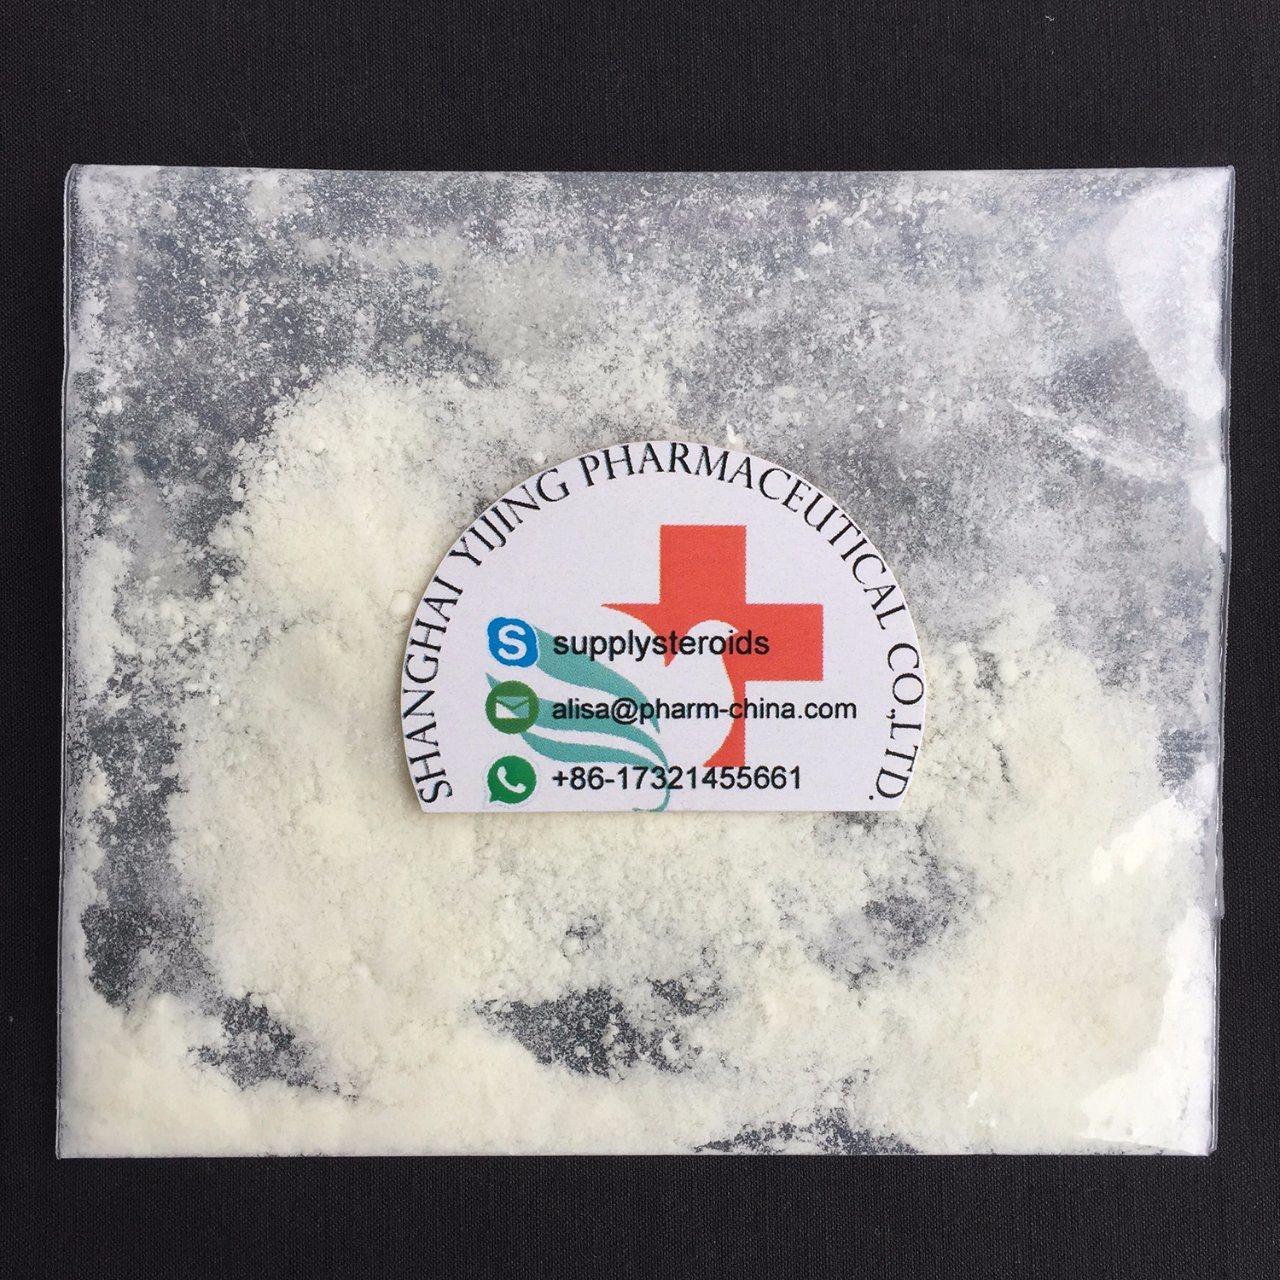 Hot Sell Apis Pharmaceutical Raw Materials Lodixanol 92339-11-2